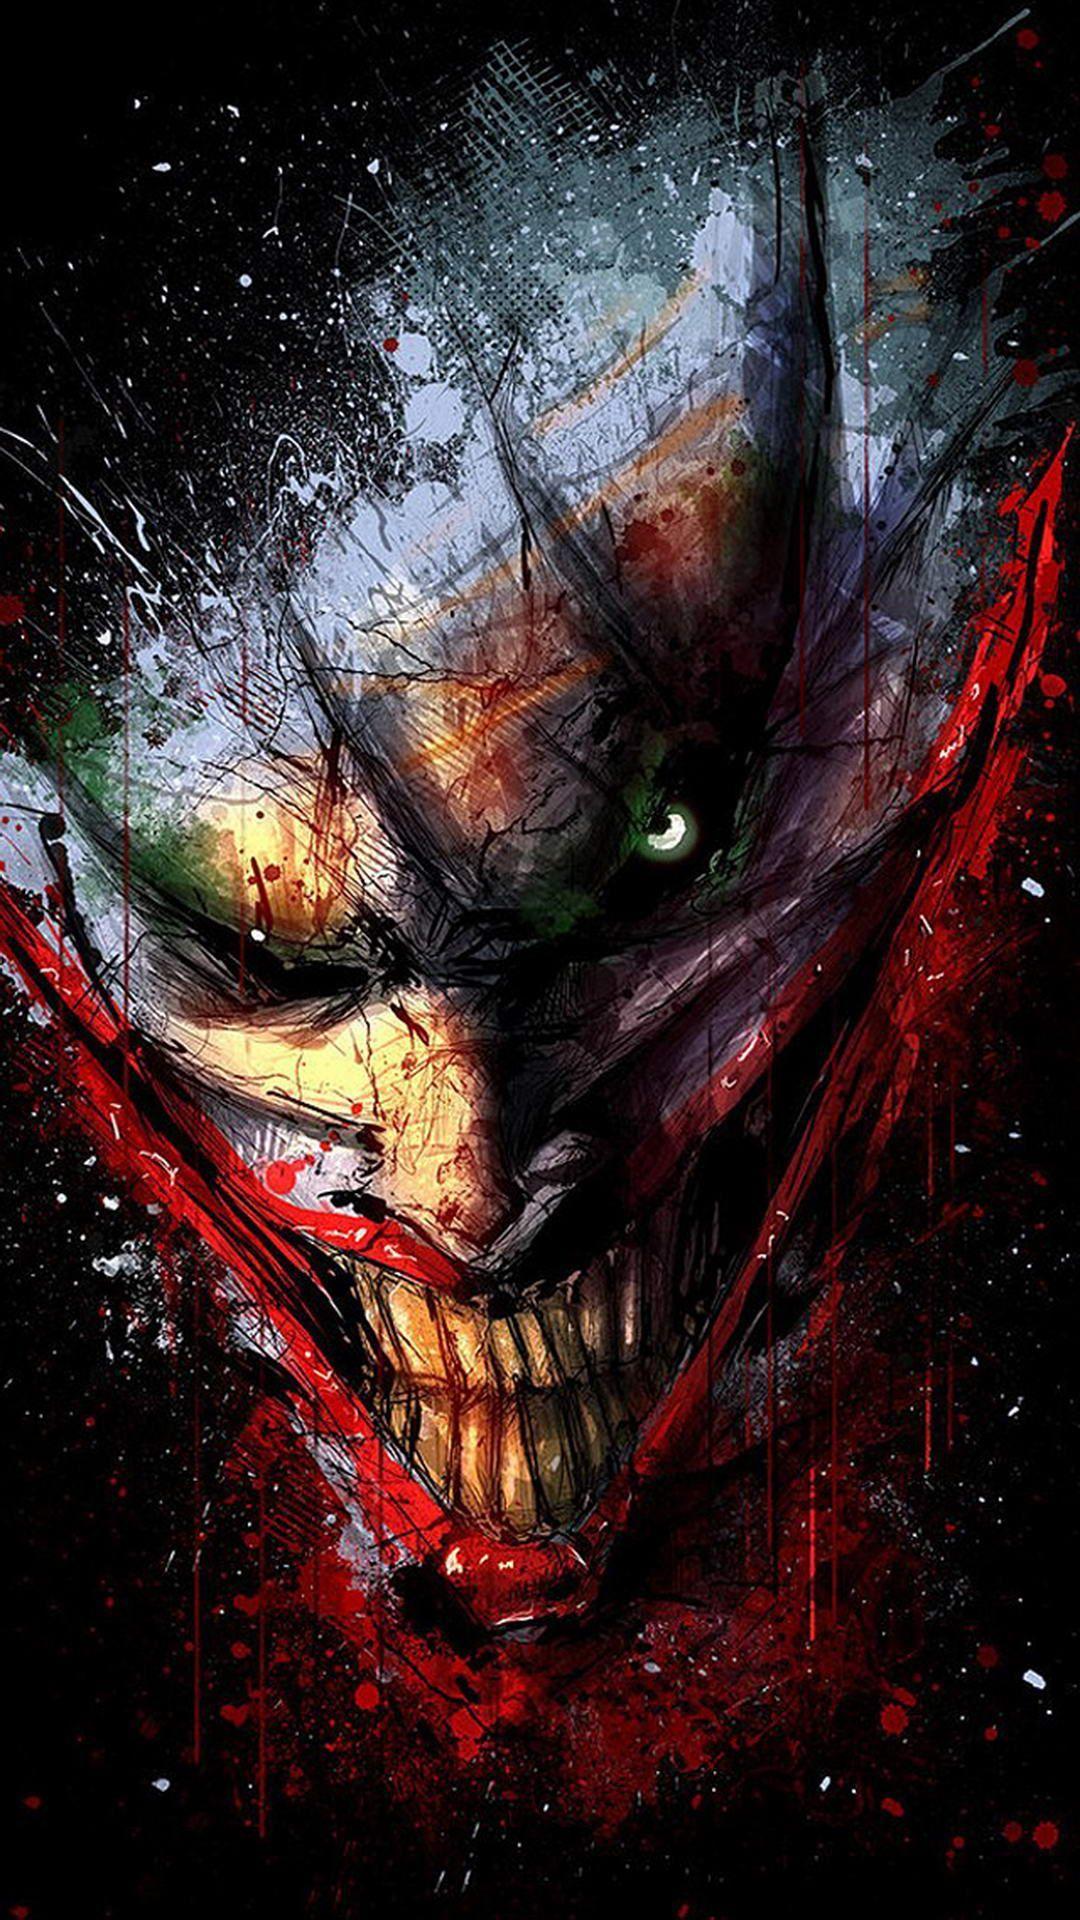 2250x1406 Joker Full HD Wallpaper And Background Image